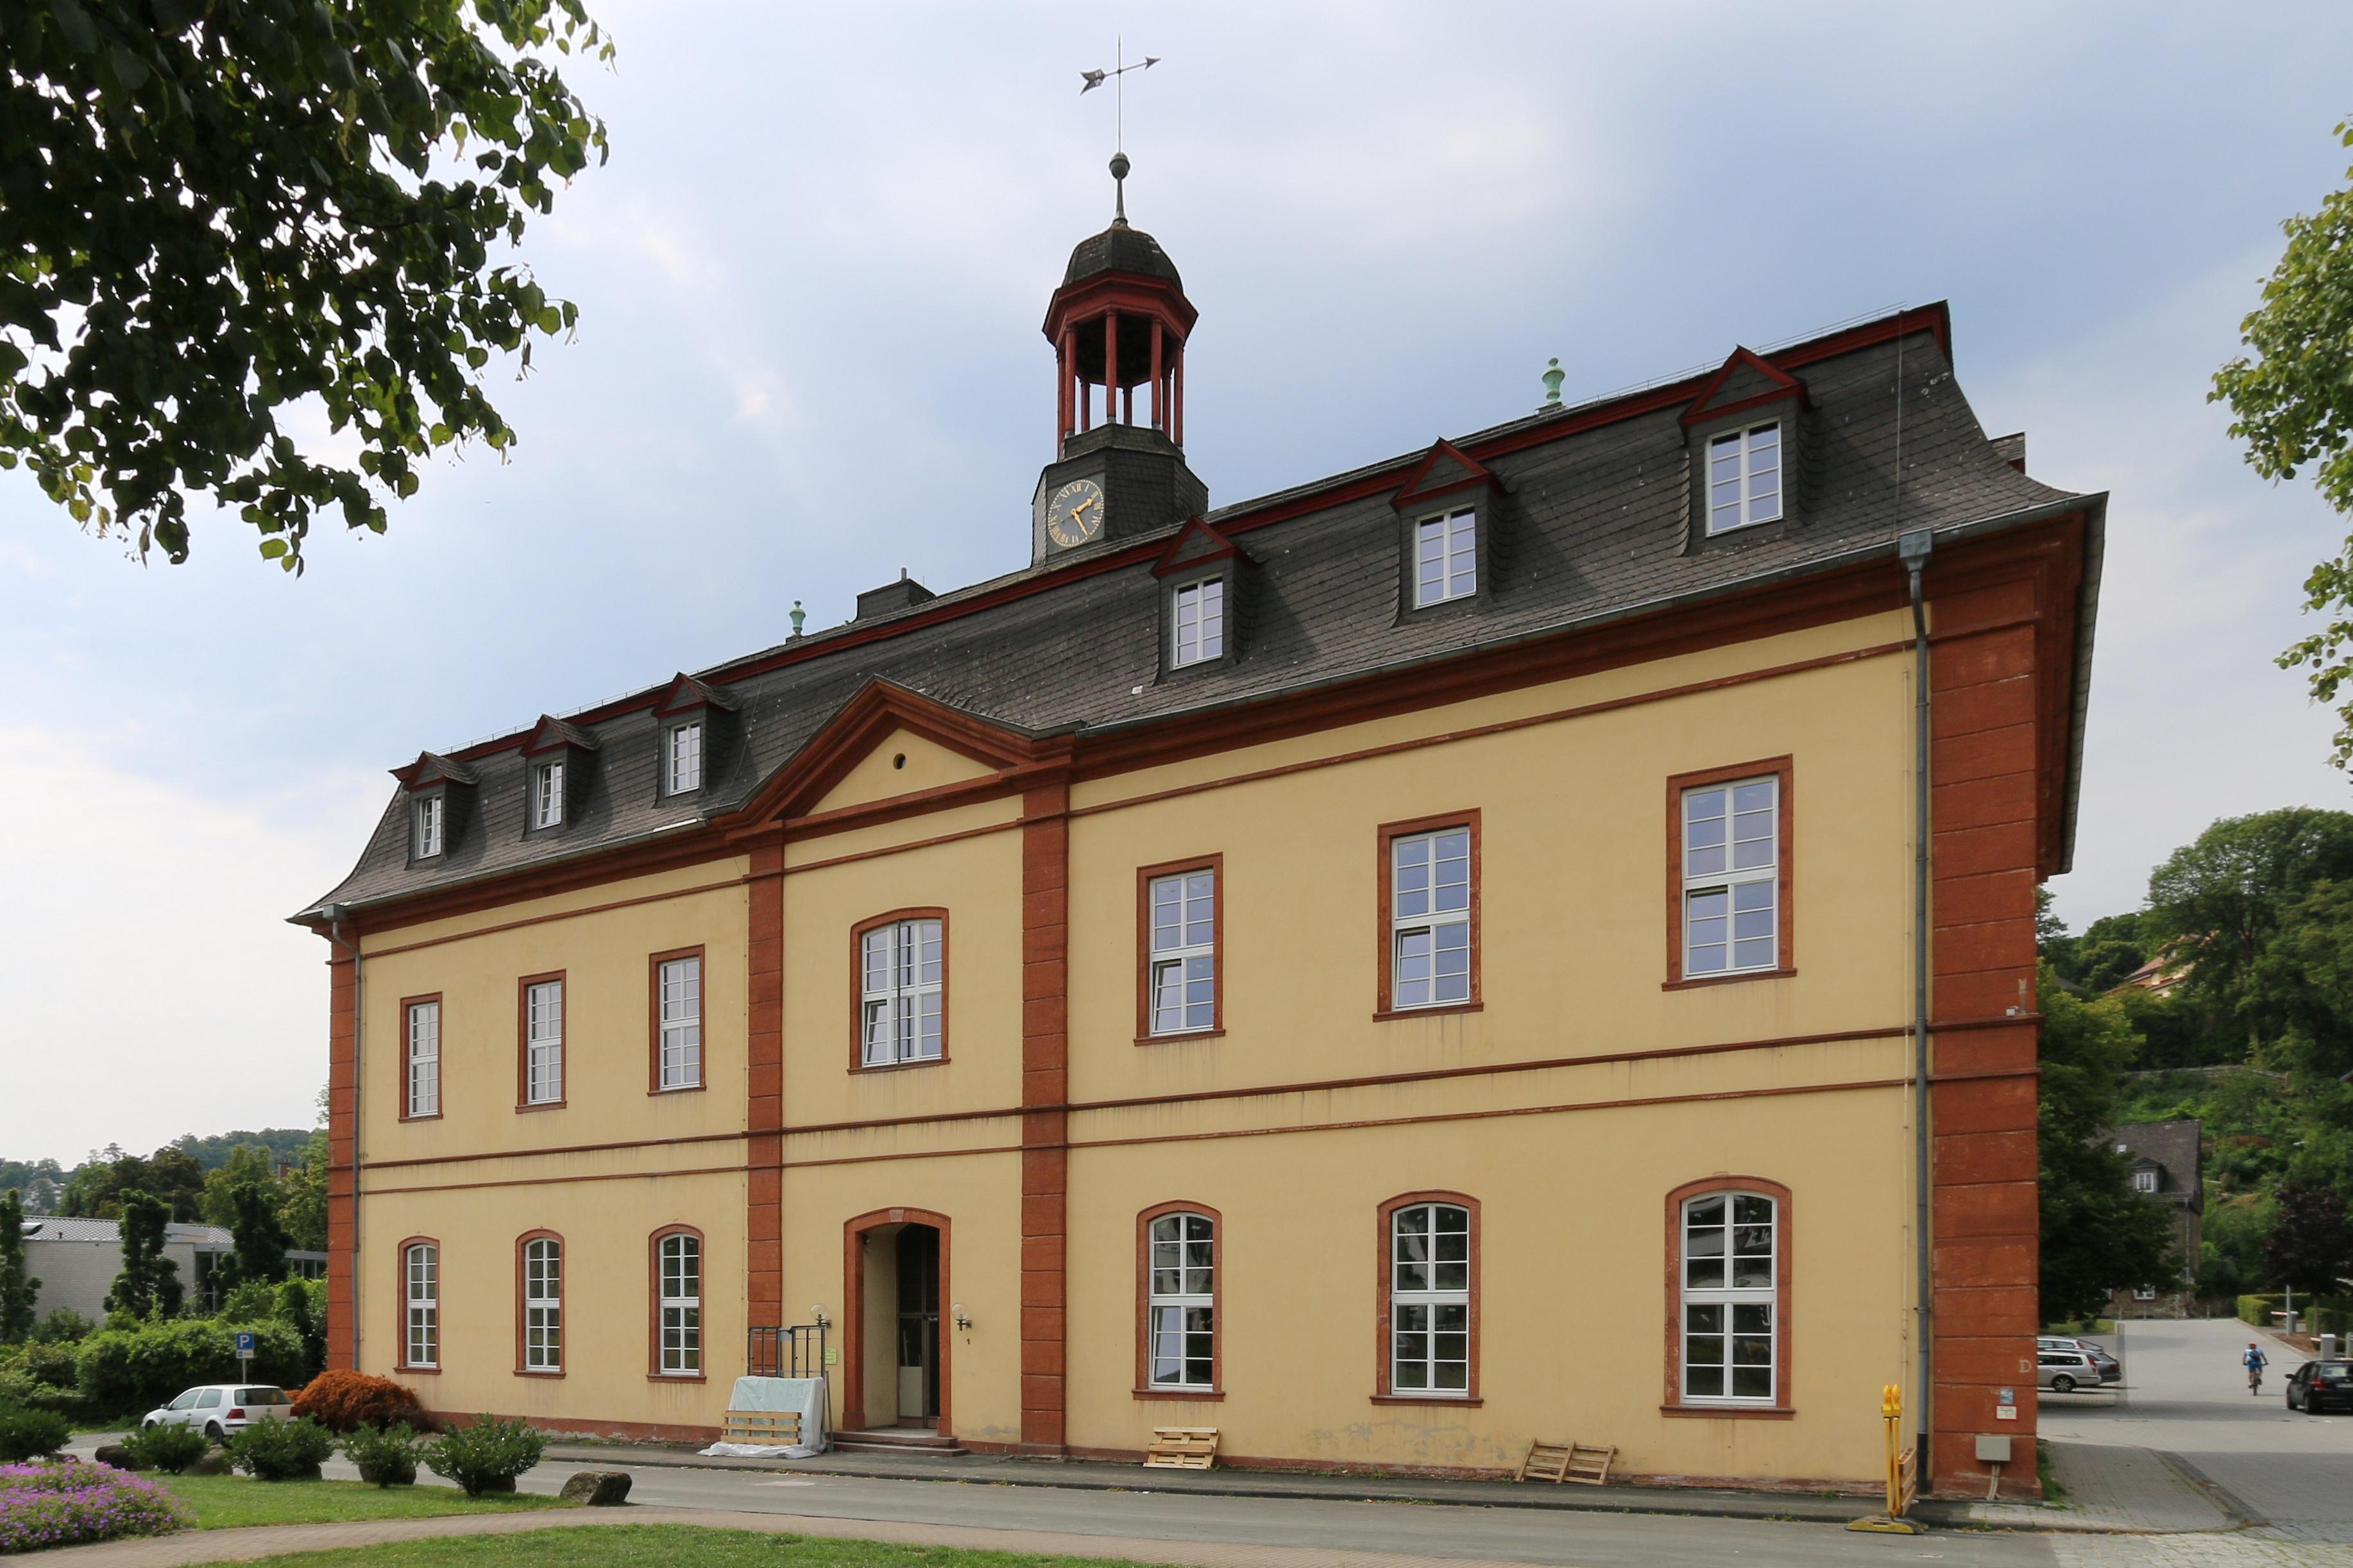 Dillenburg - Archiv Hofgartenstraße 1 (KD.HE 132533 2 08.2015).jpg